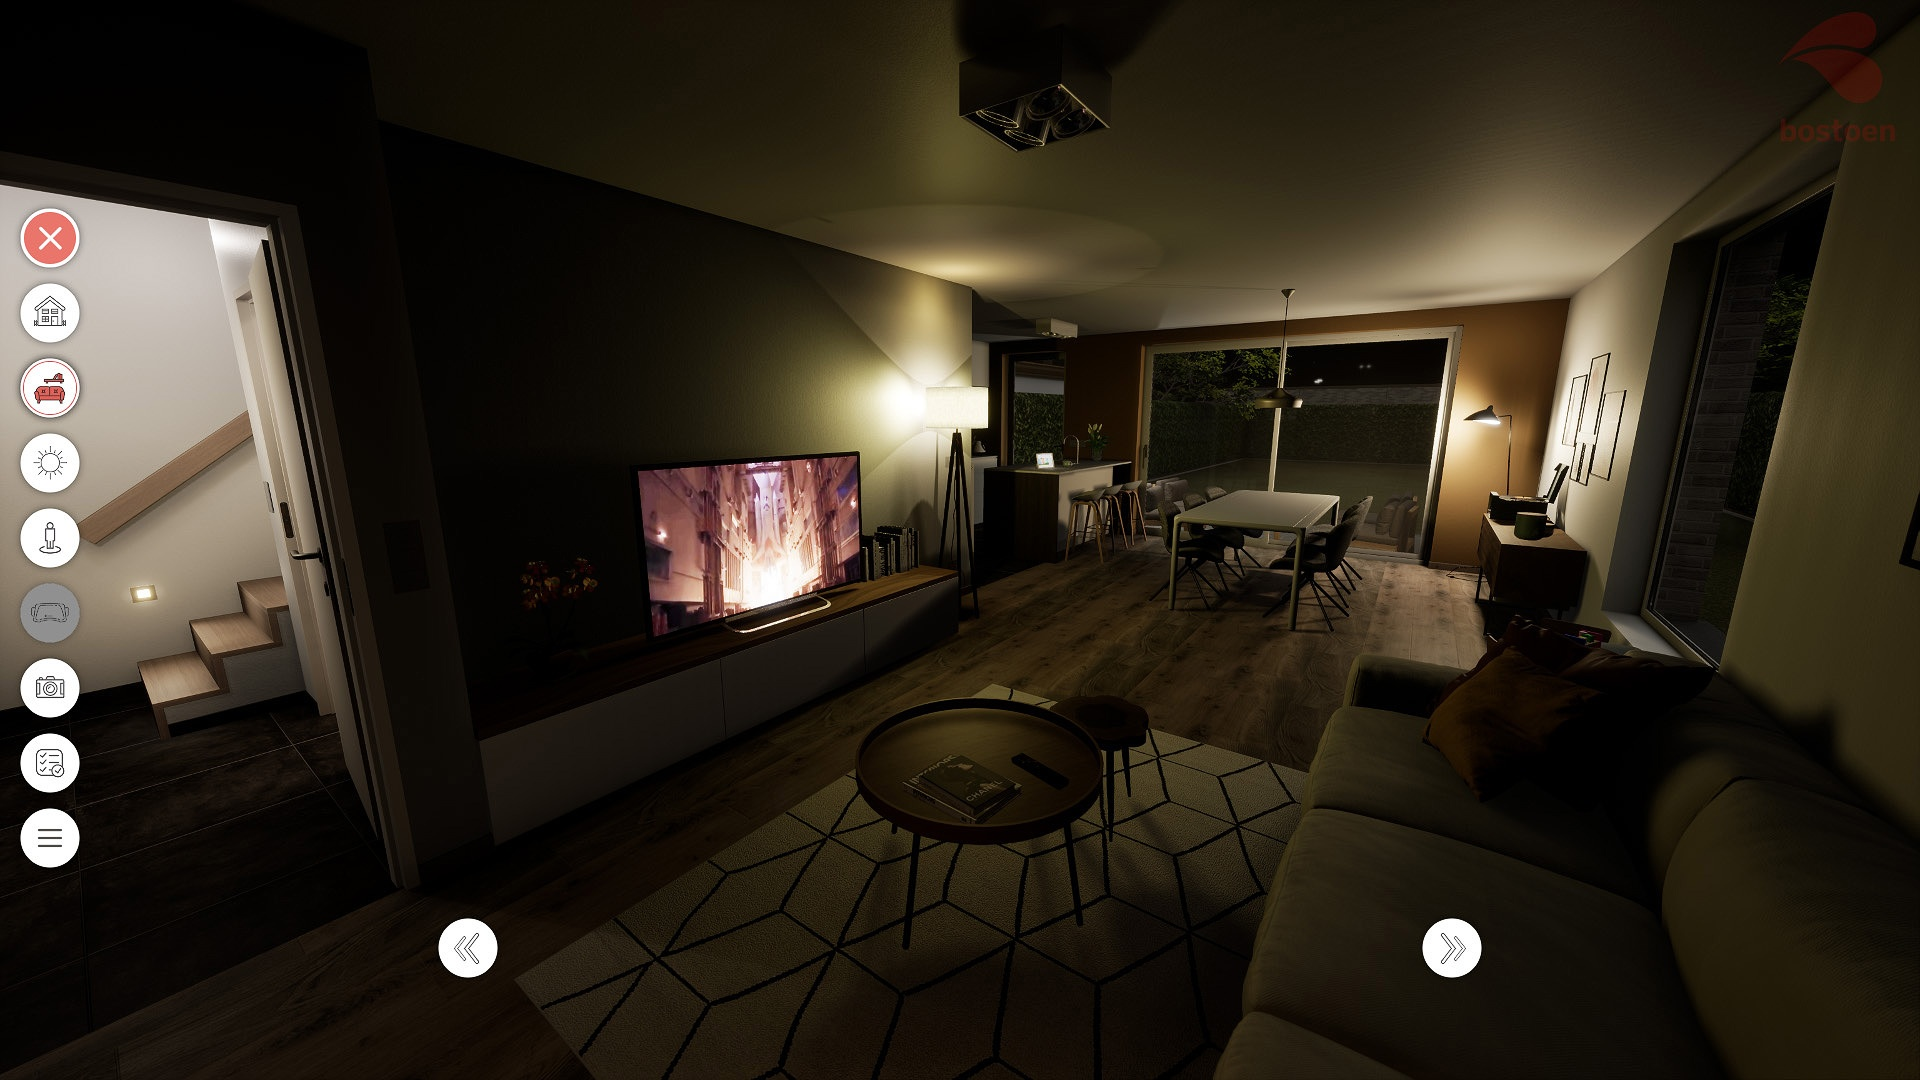 Bostoen Virtual Reality woning woonkamer nacht